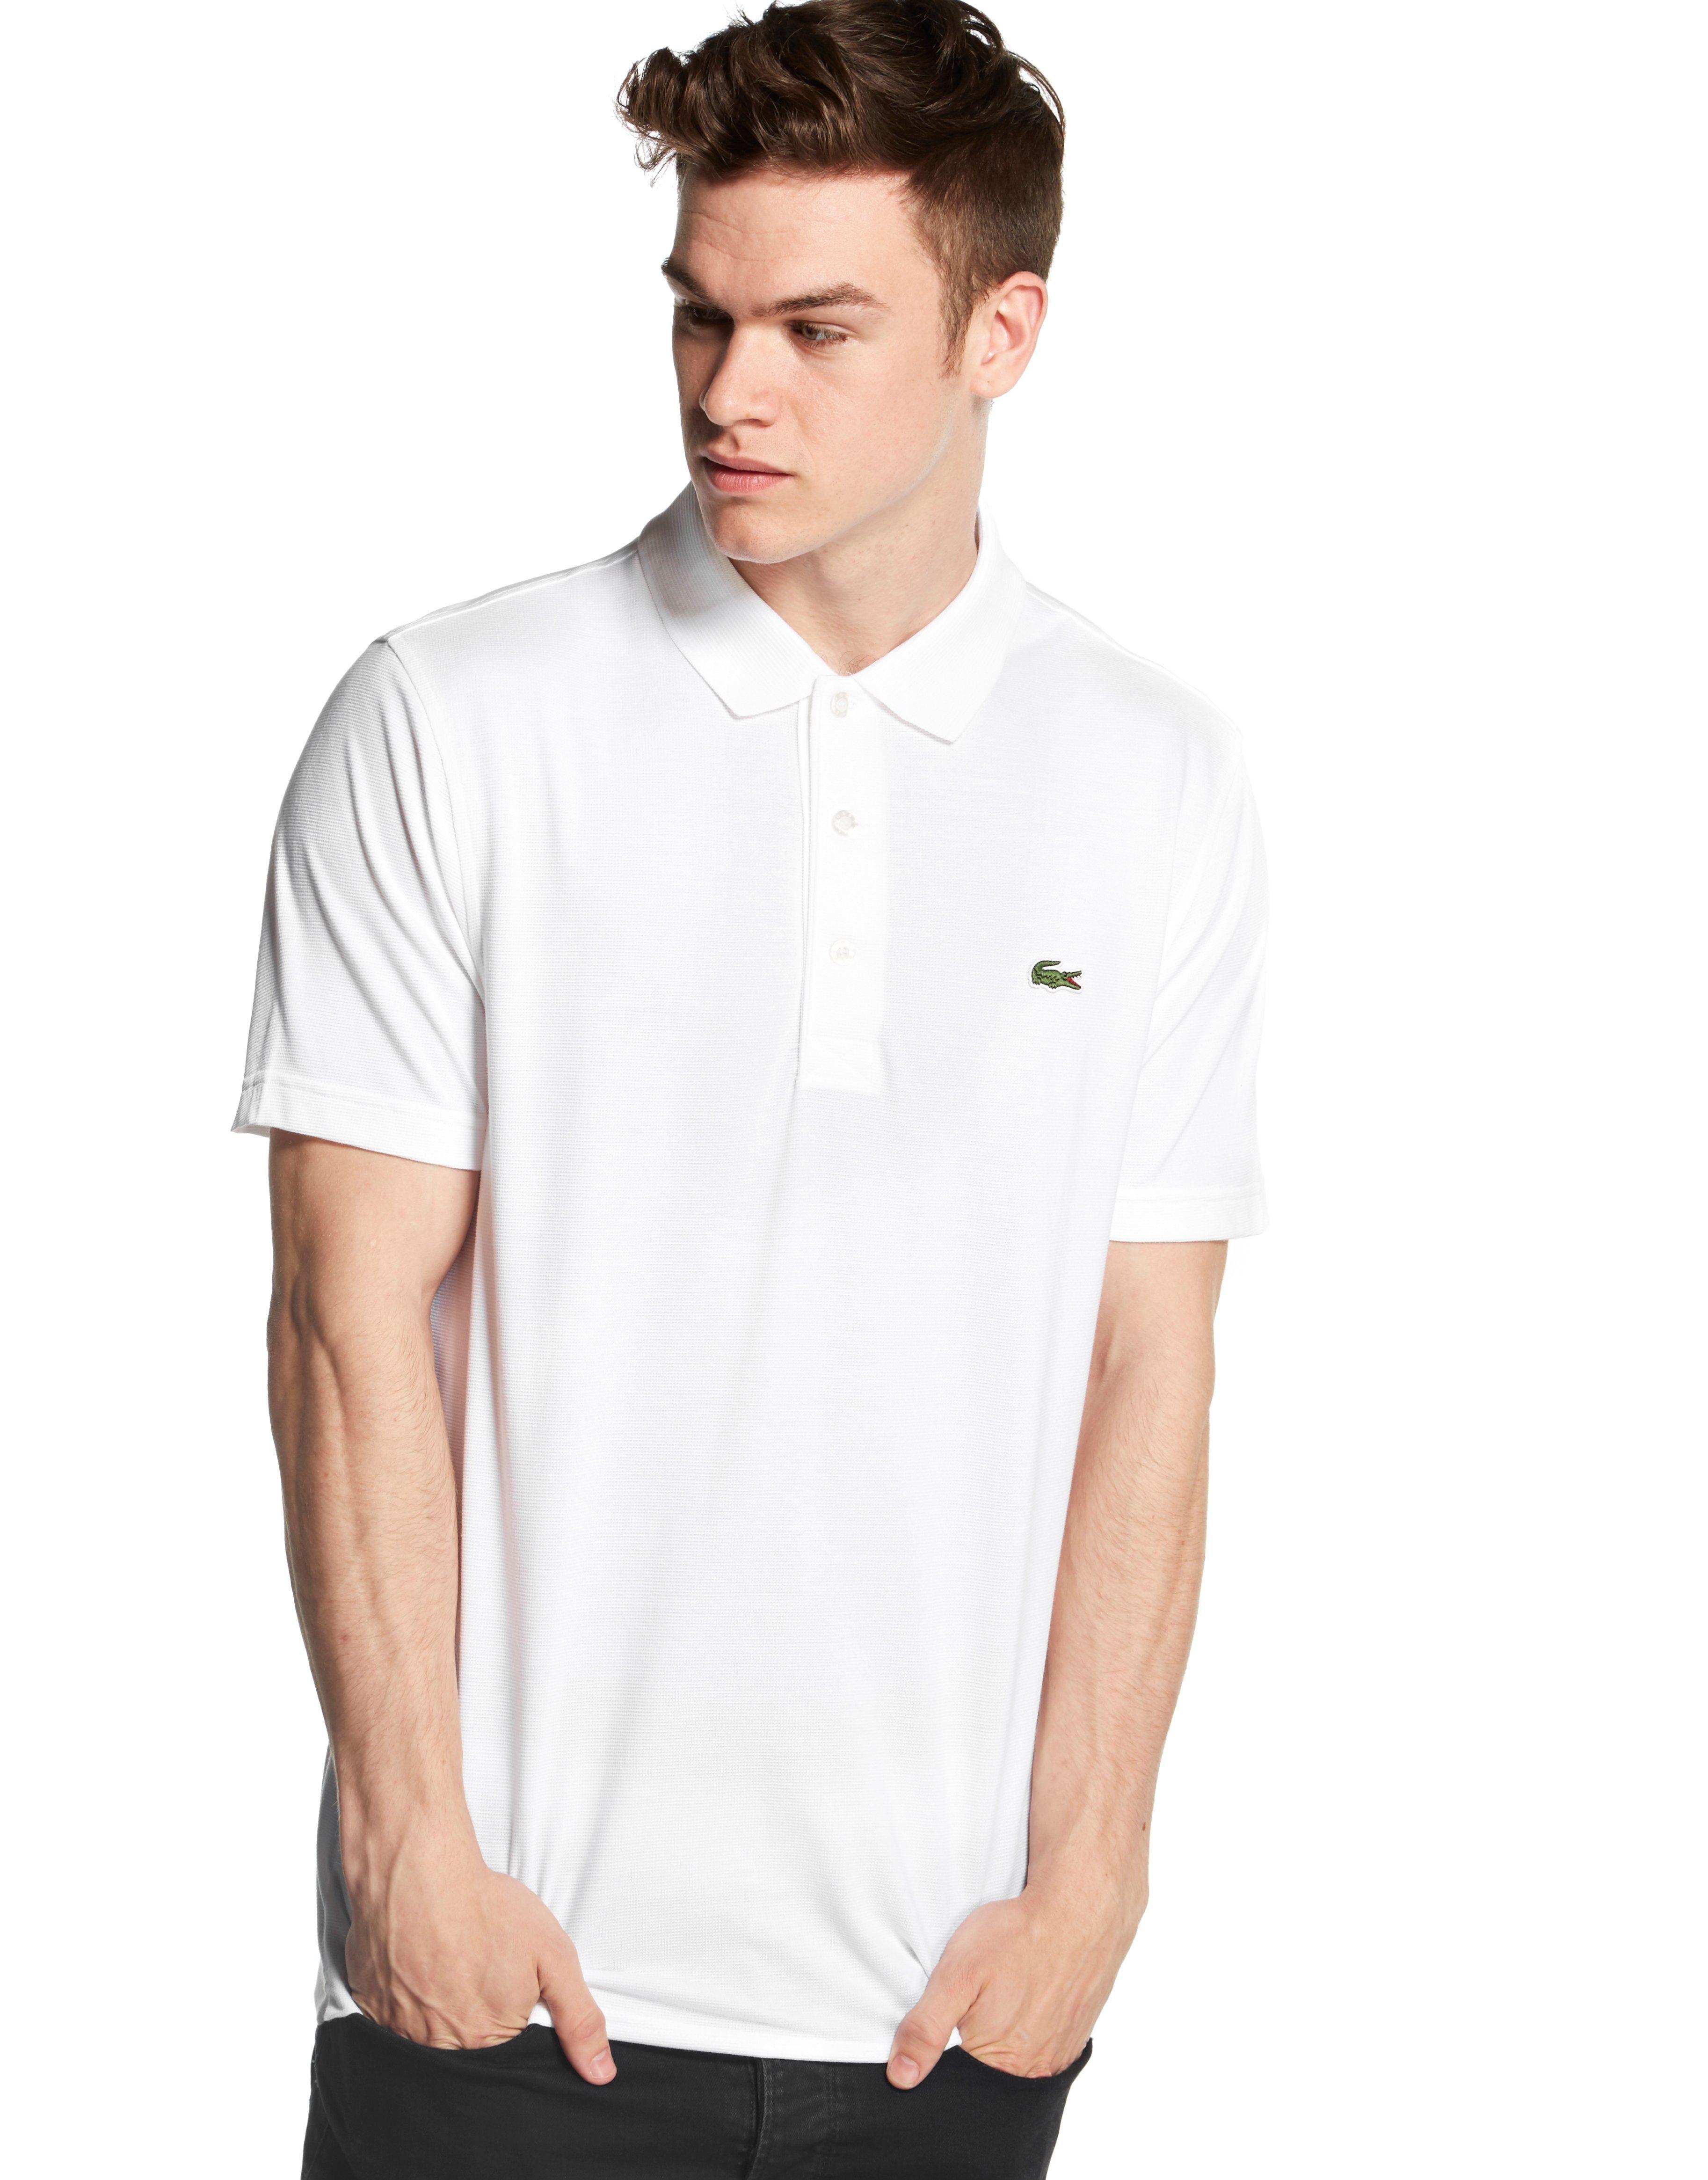 005eb1105 Lacoste Alligator Short Sleeve Polo Shirt | JD Sports